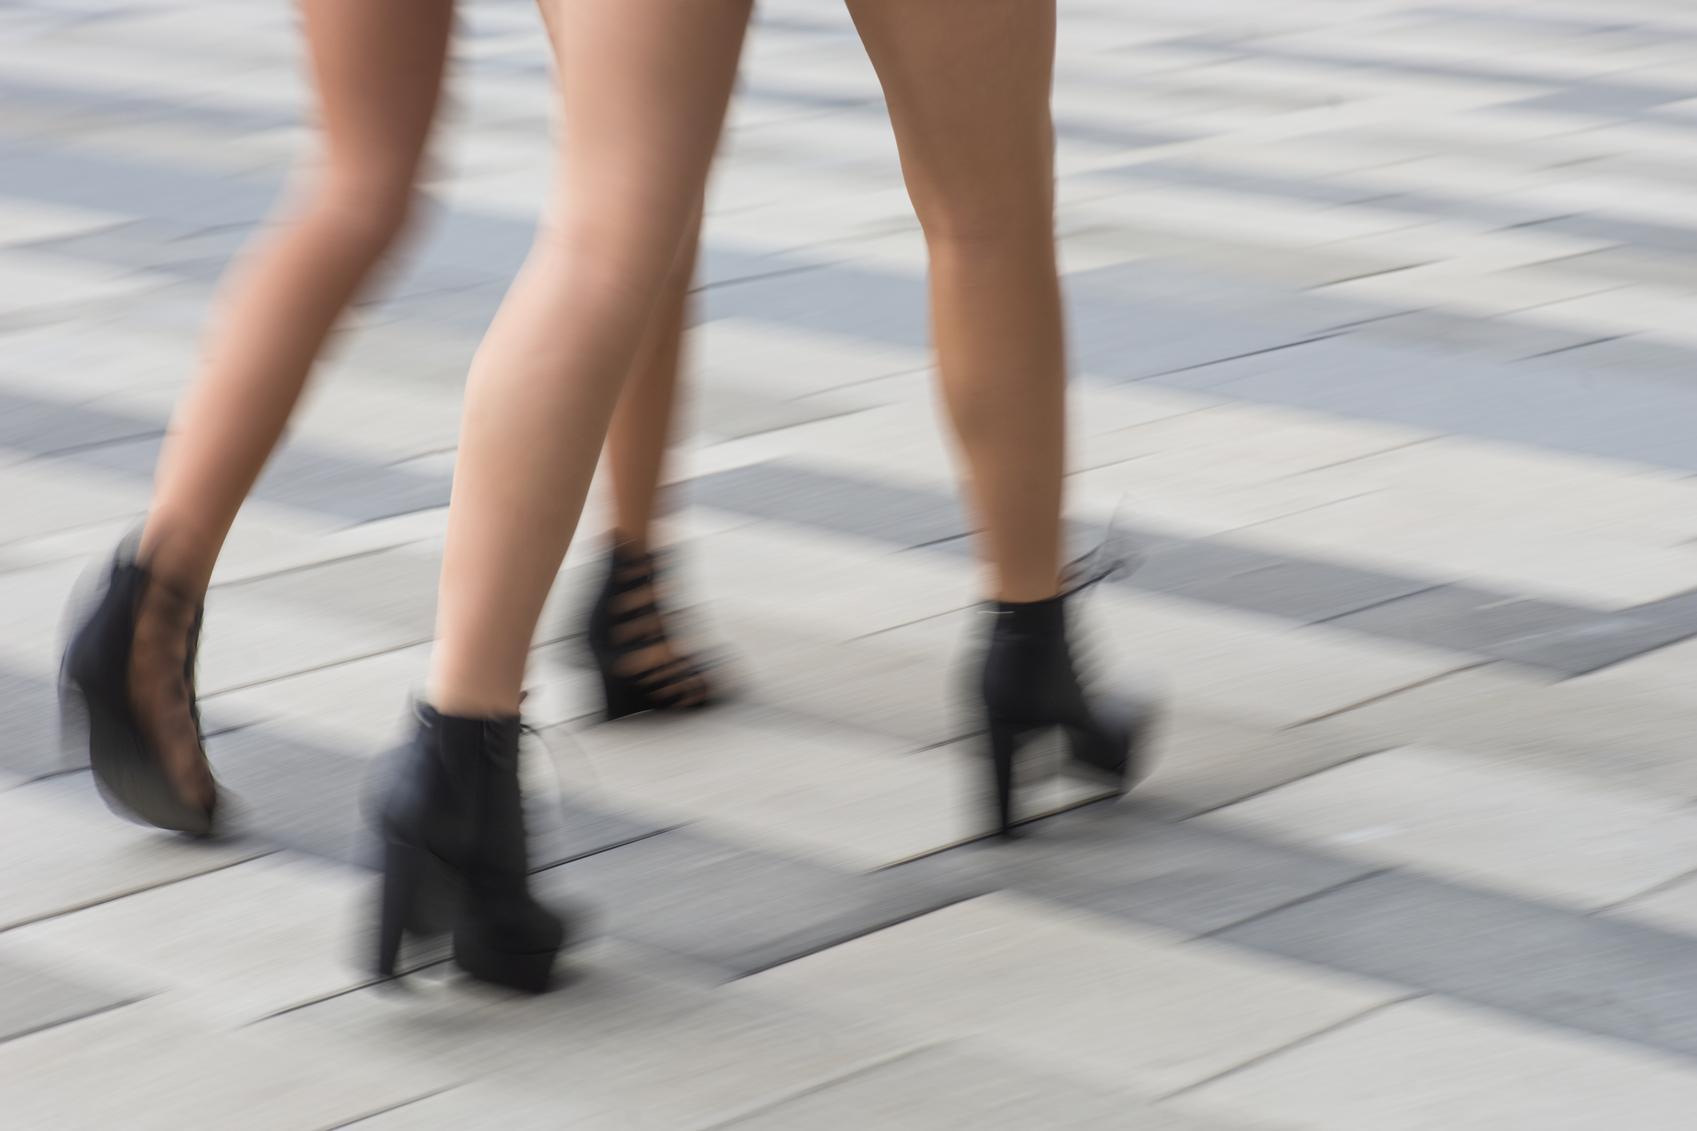 Imagen borrosa piernas mujeres